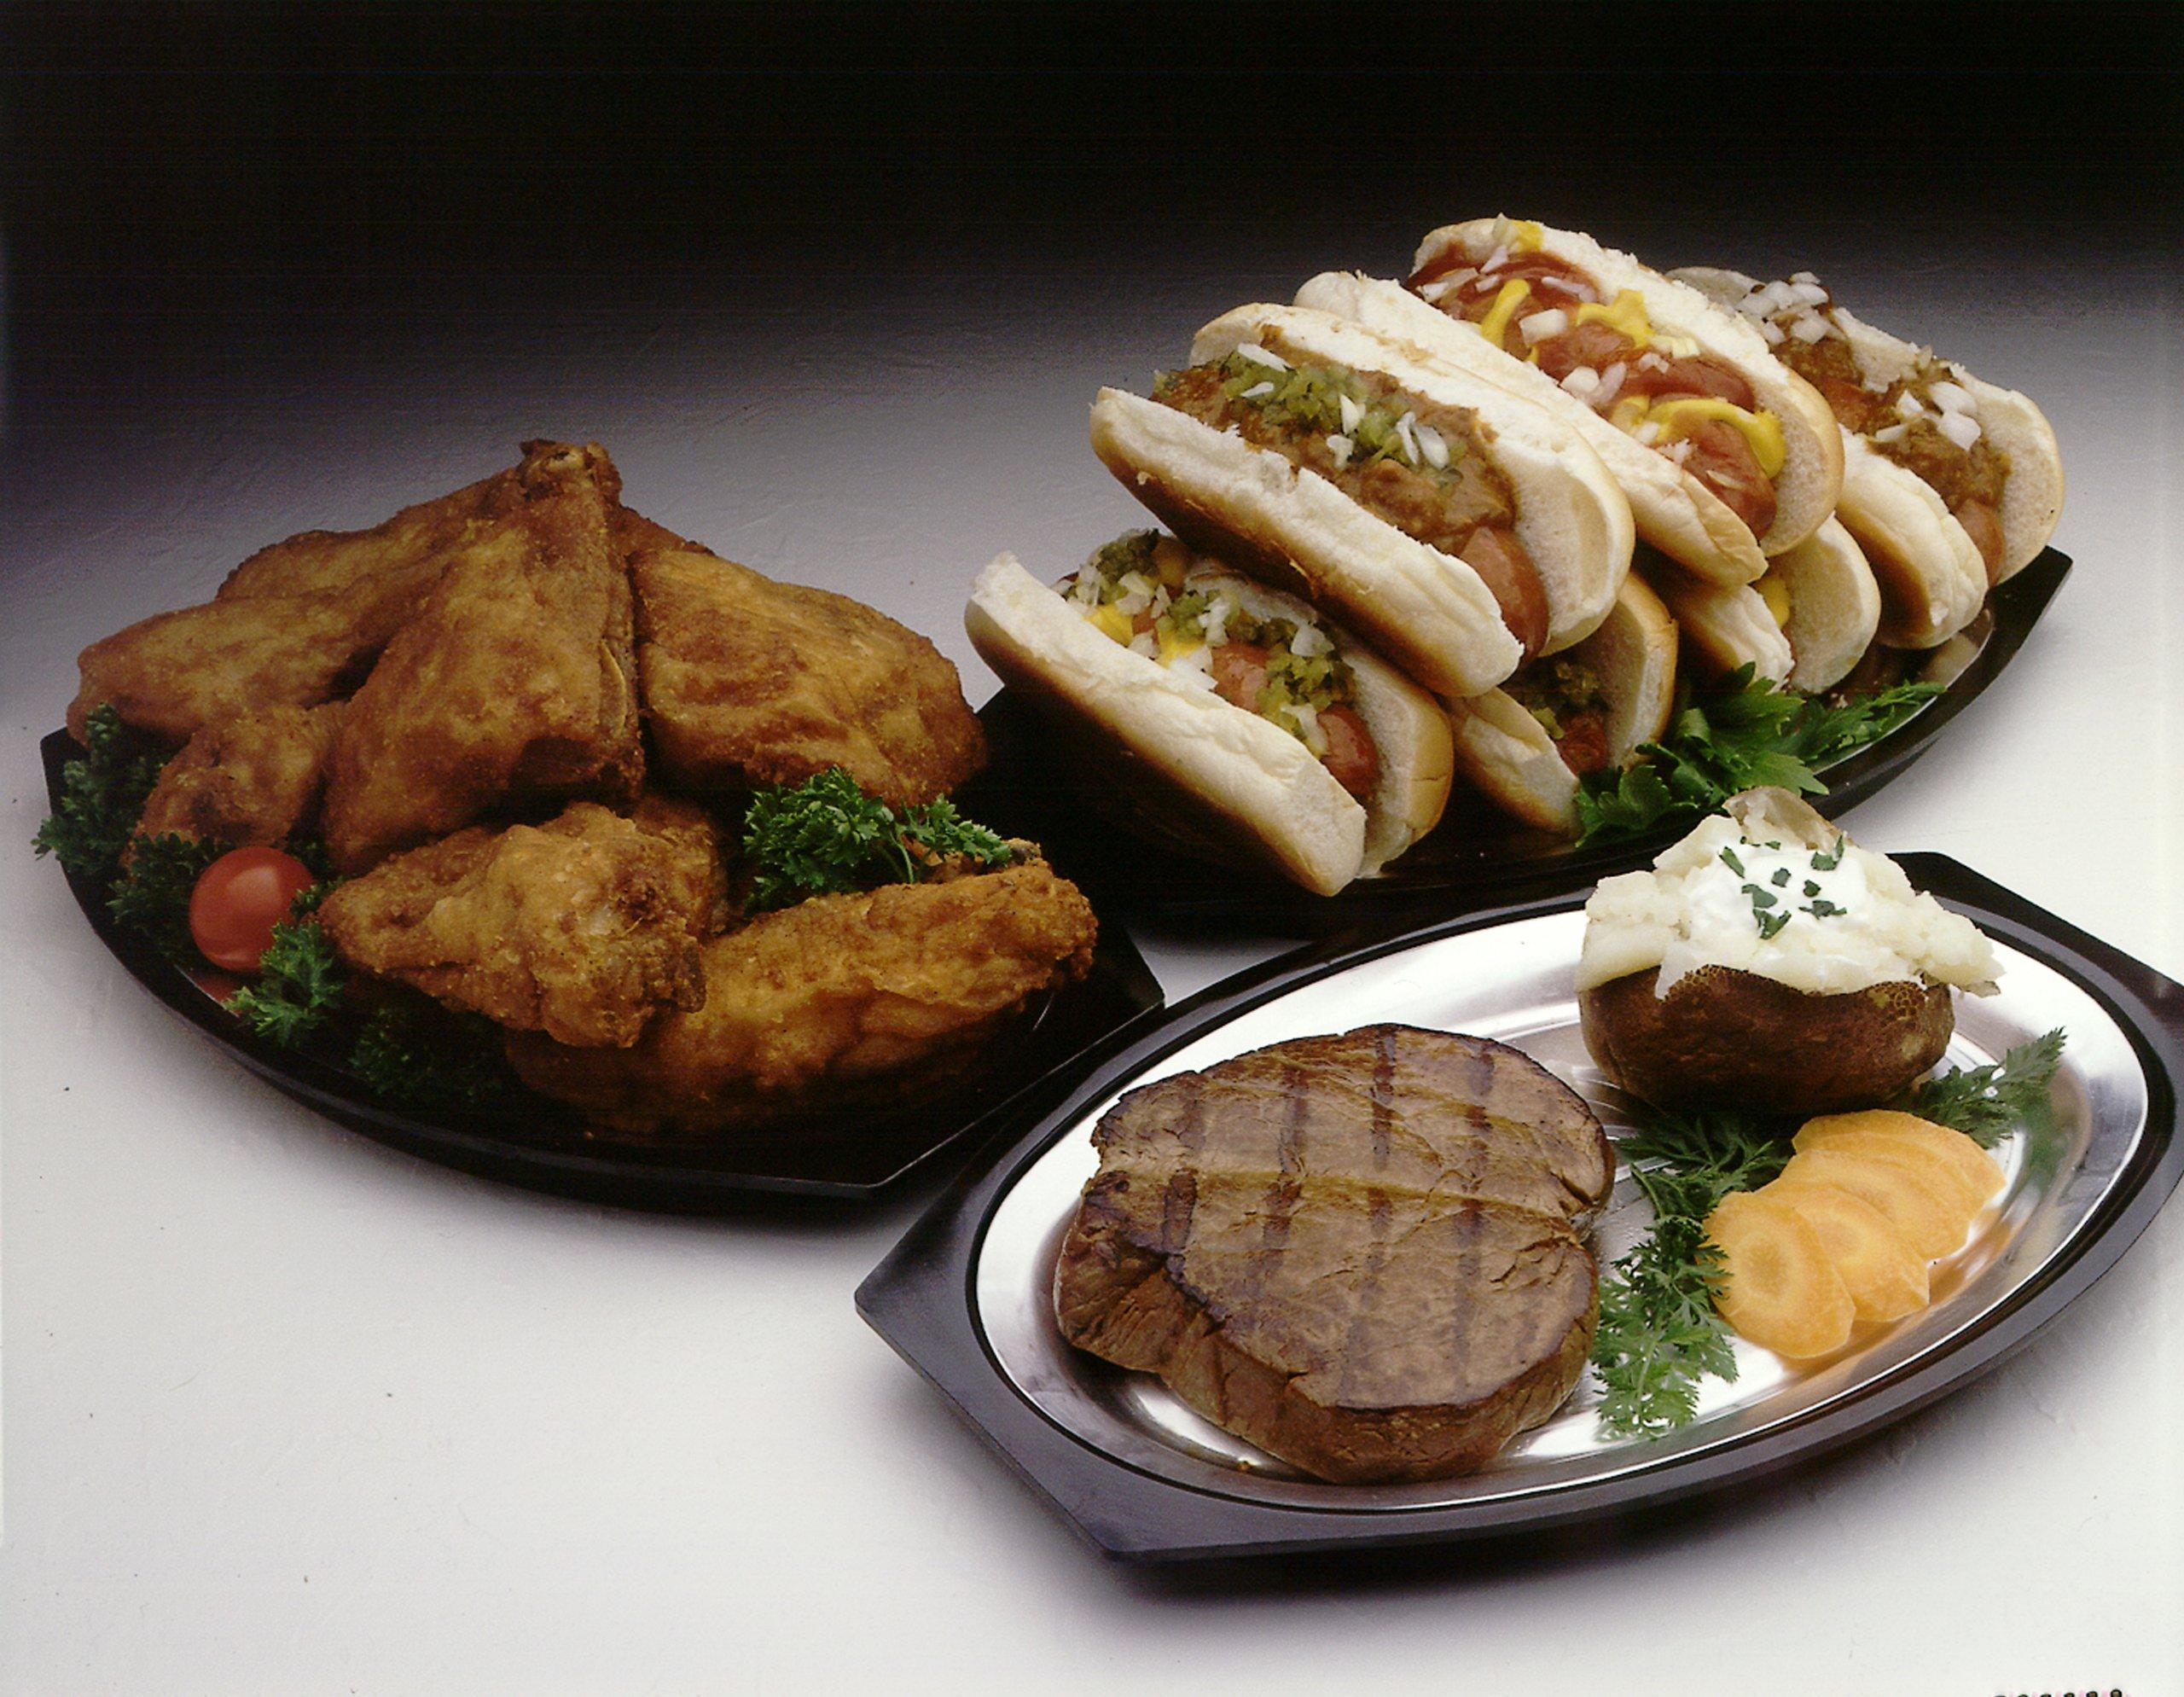 Nordic Ware Steak 'n Fajita Platter Server